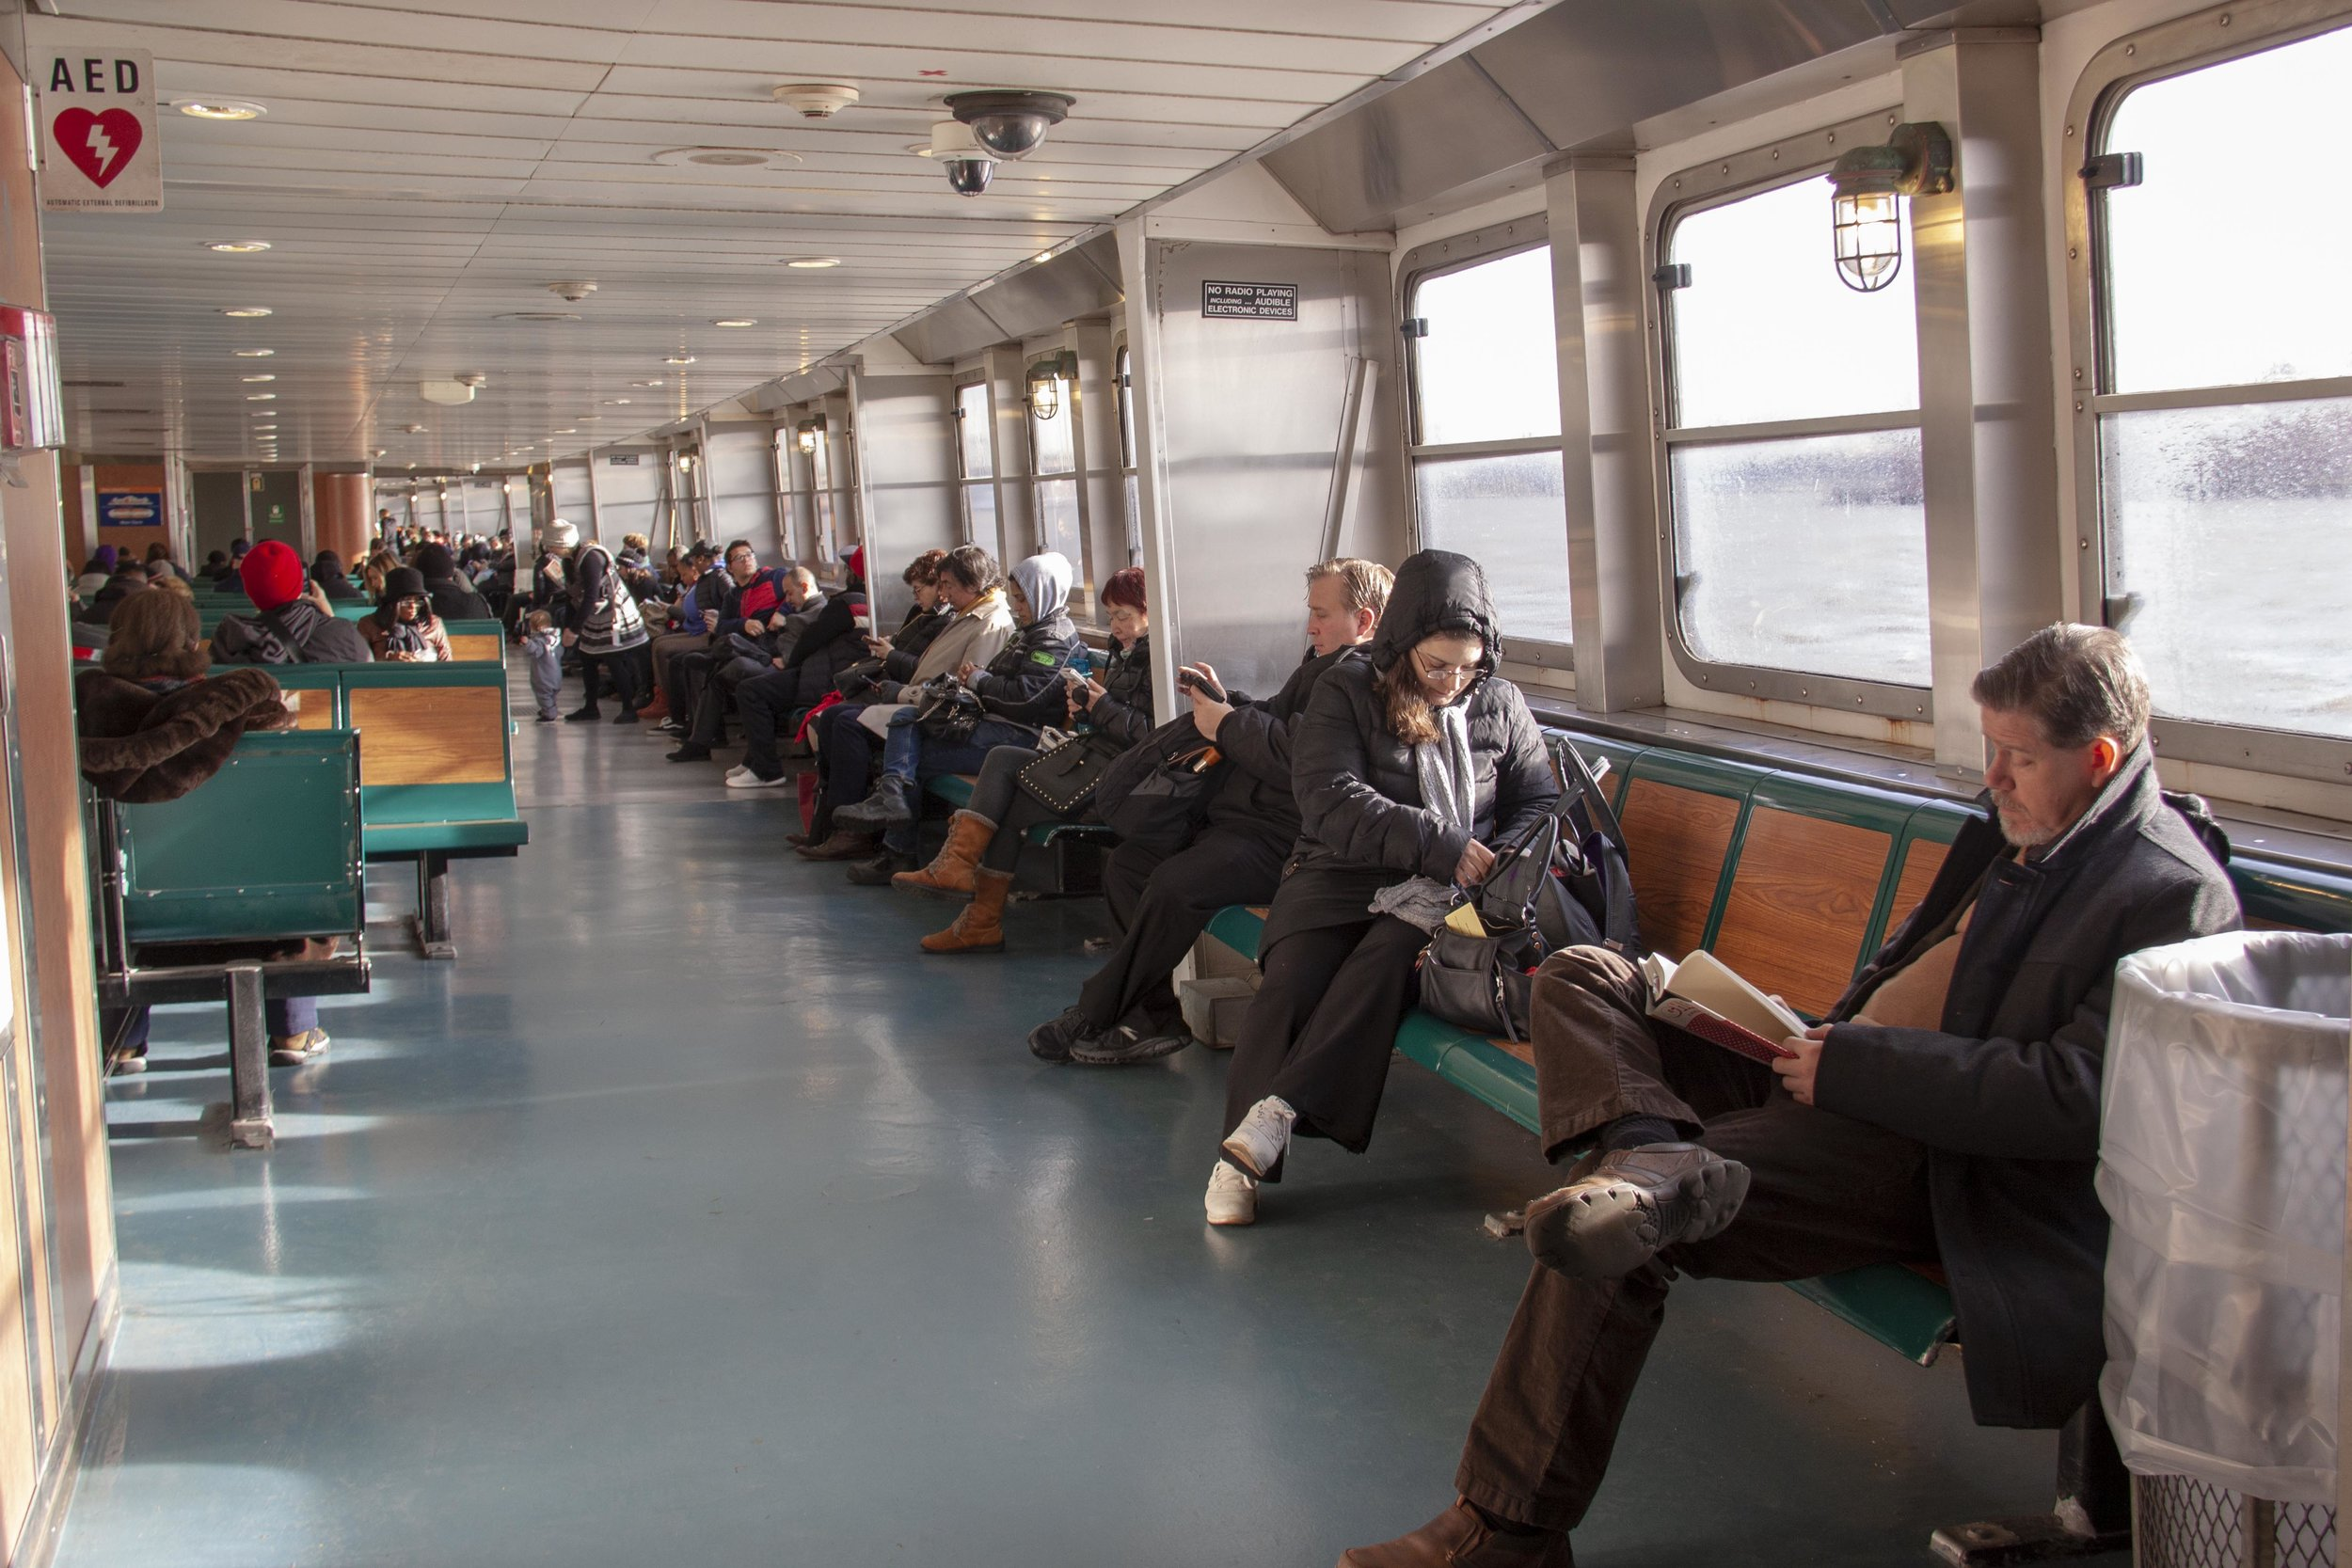 Ferry commuters, PHOTO CREDIT: Neshi Galindo